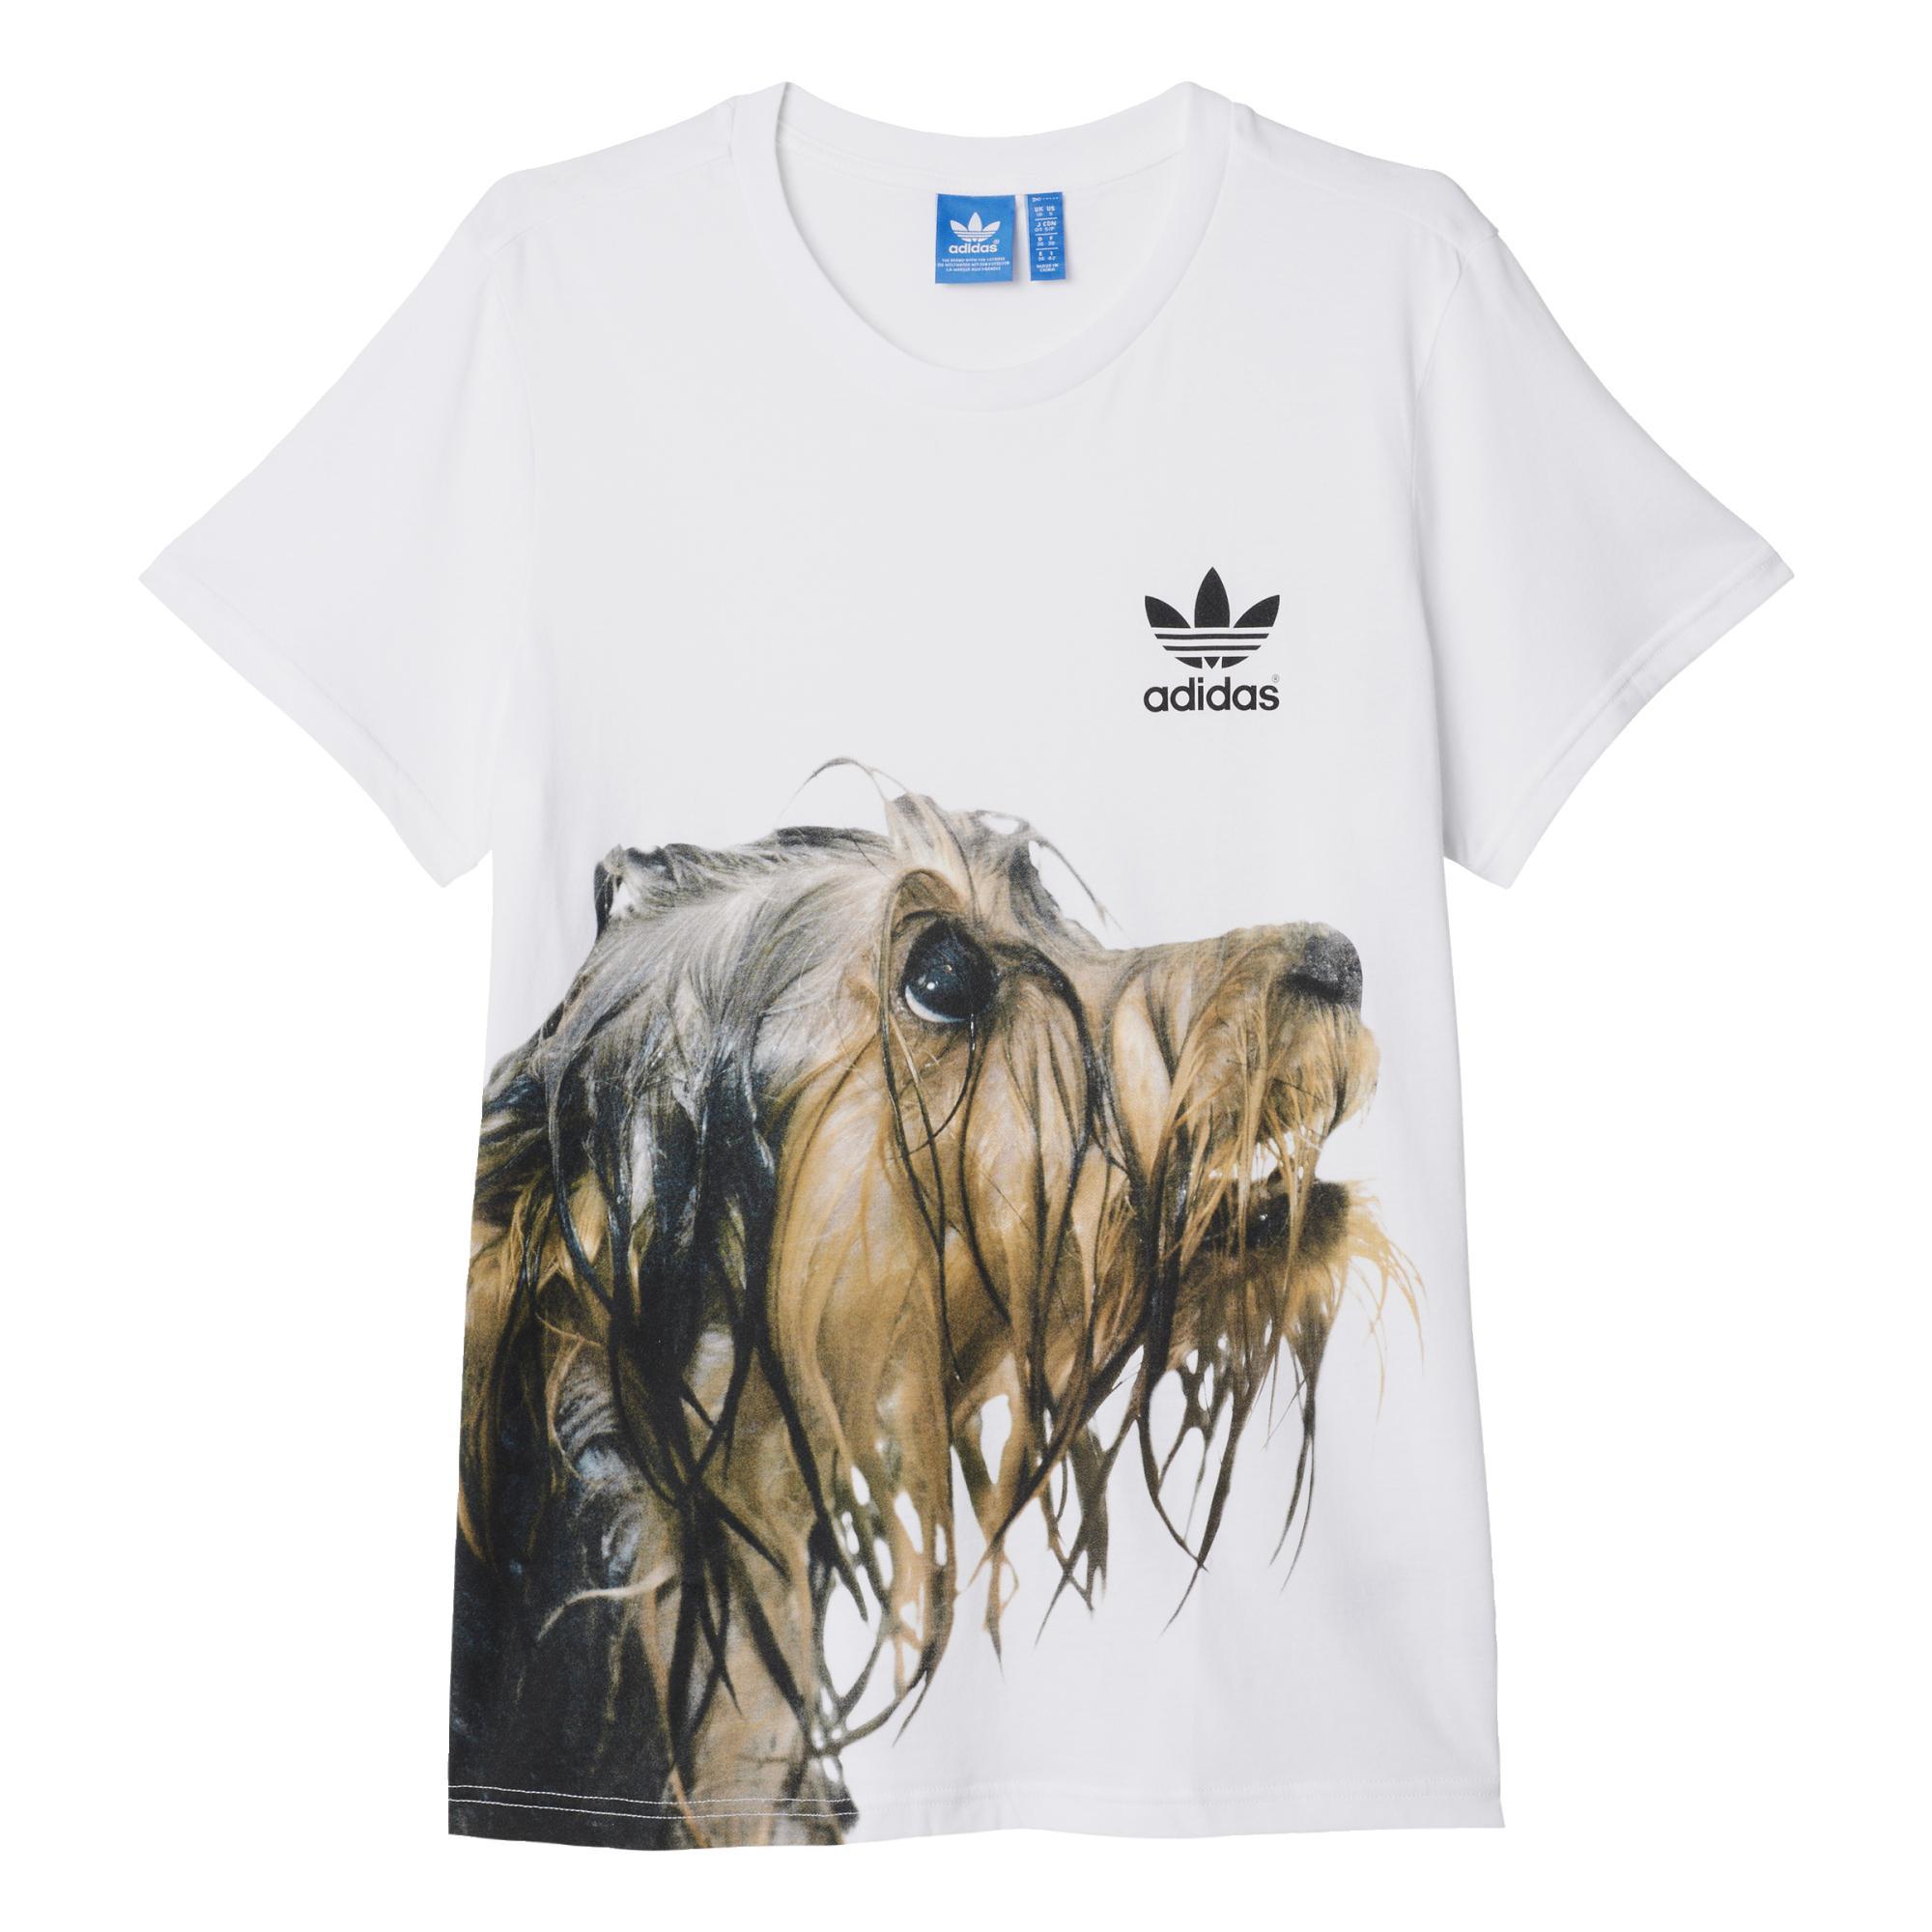 quality design 8b29a 97ae2 Adidas Originals Mujer Camiseta Puppy Pooch Rita Ora (blanco)